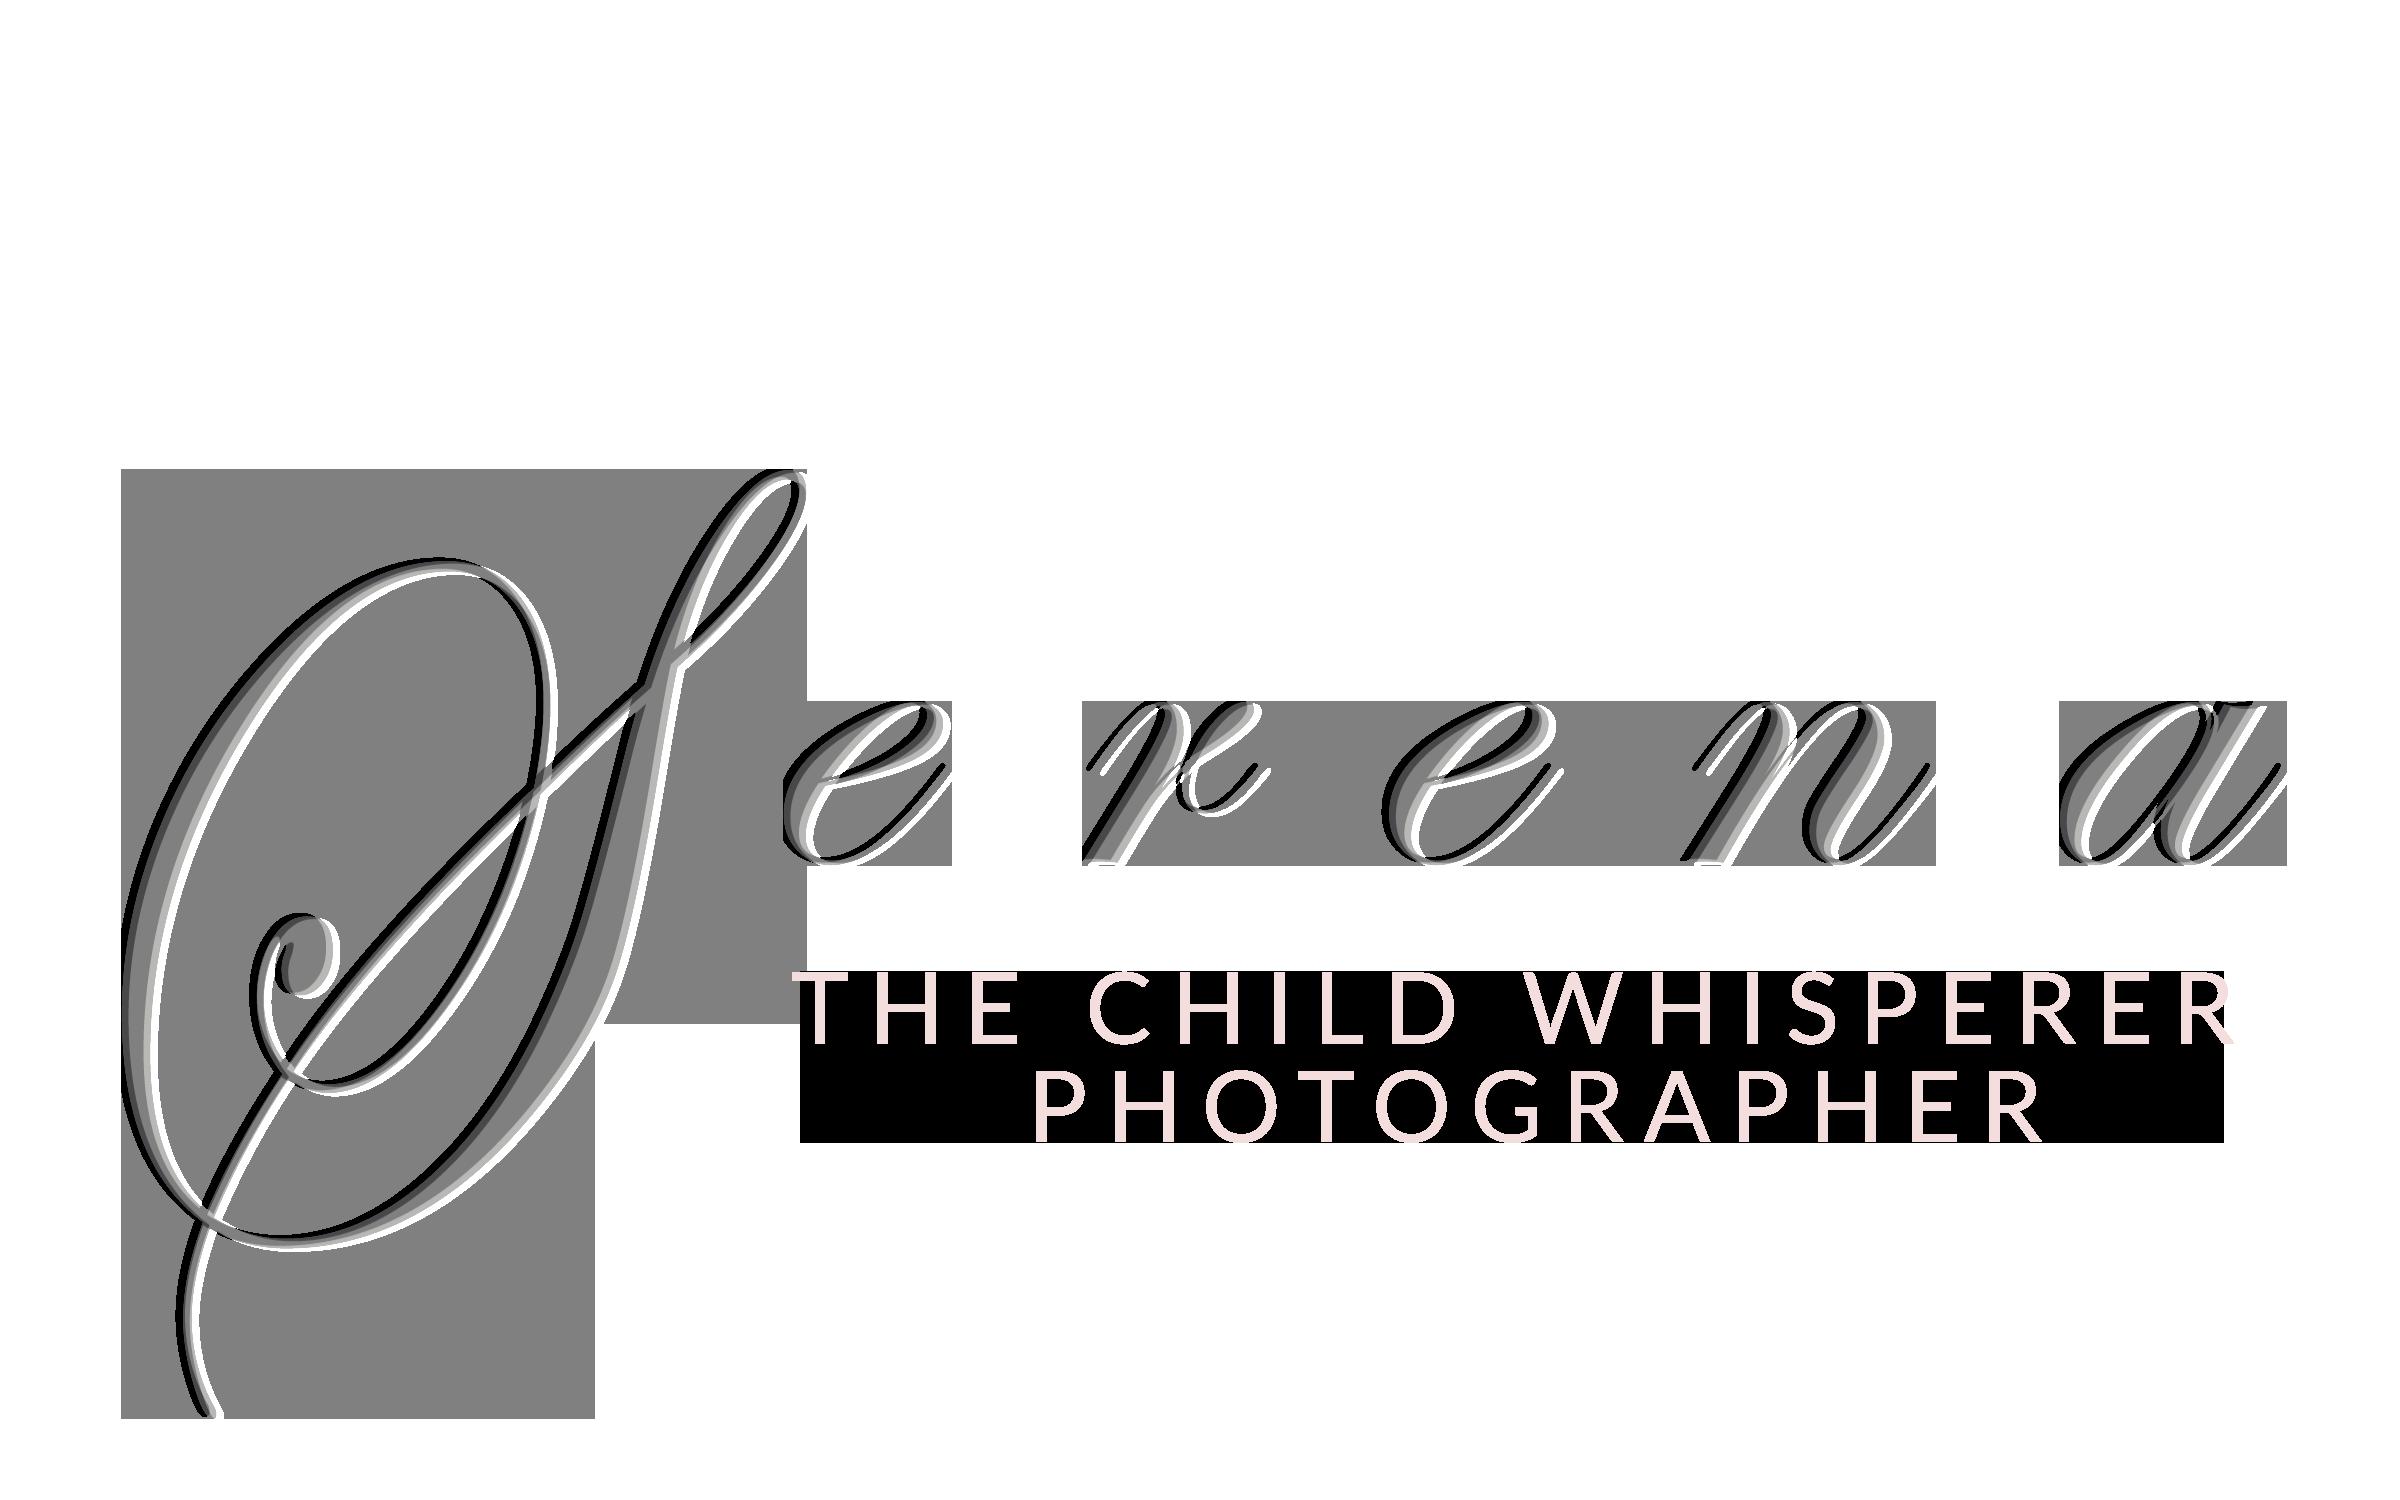 logo squarechildwhispererrectangular